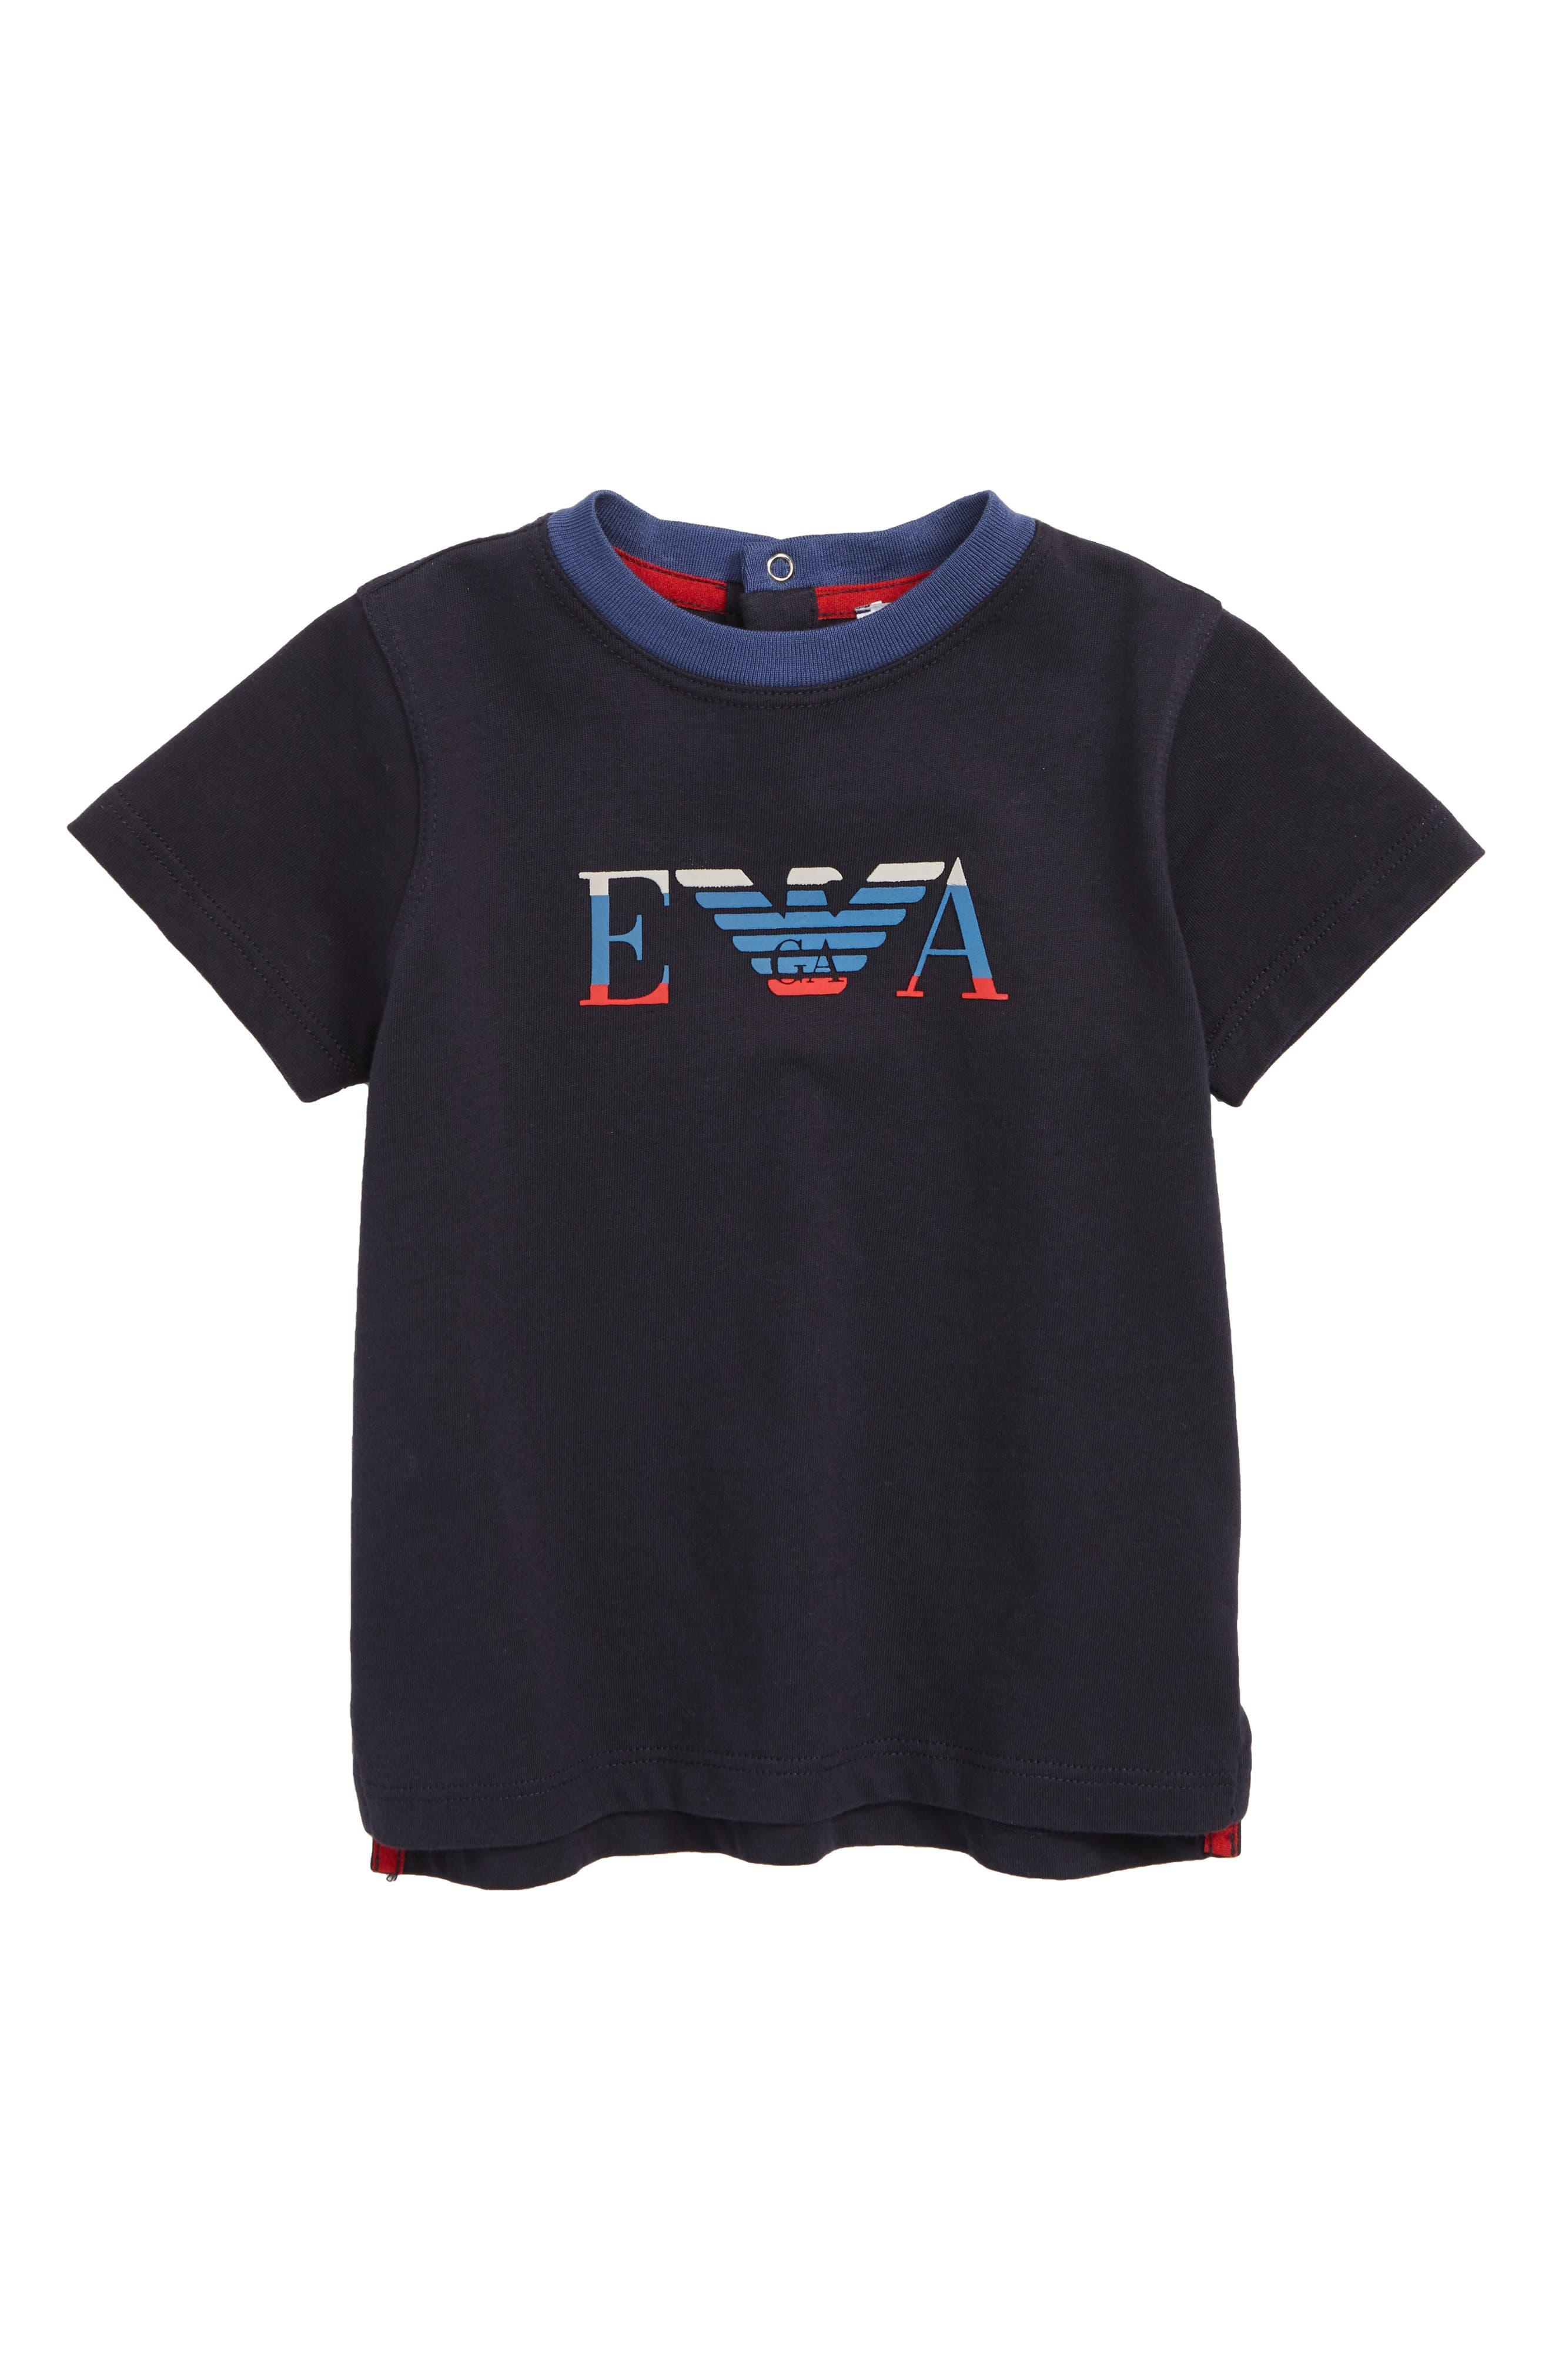 Graphic T-Shirt,                             Main thumbnail 1, color,                             SOLID BLUE NAVY